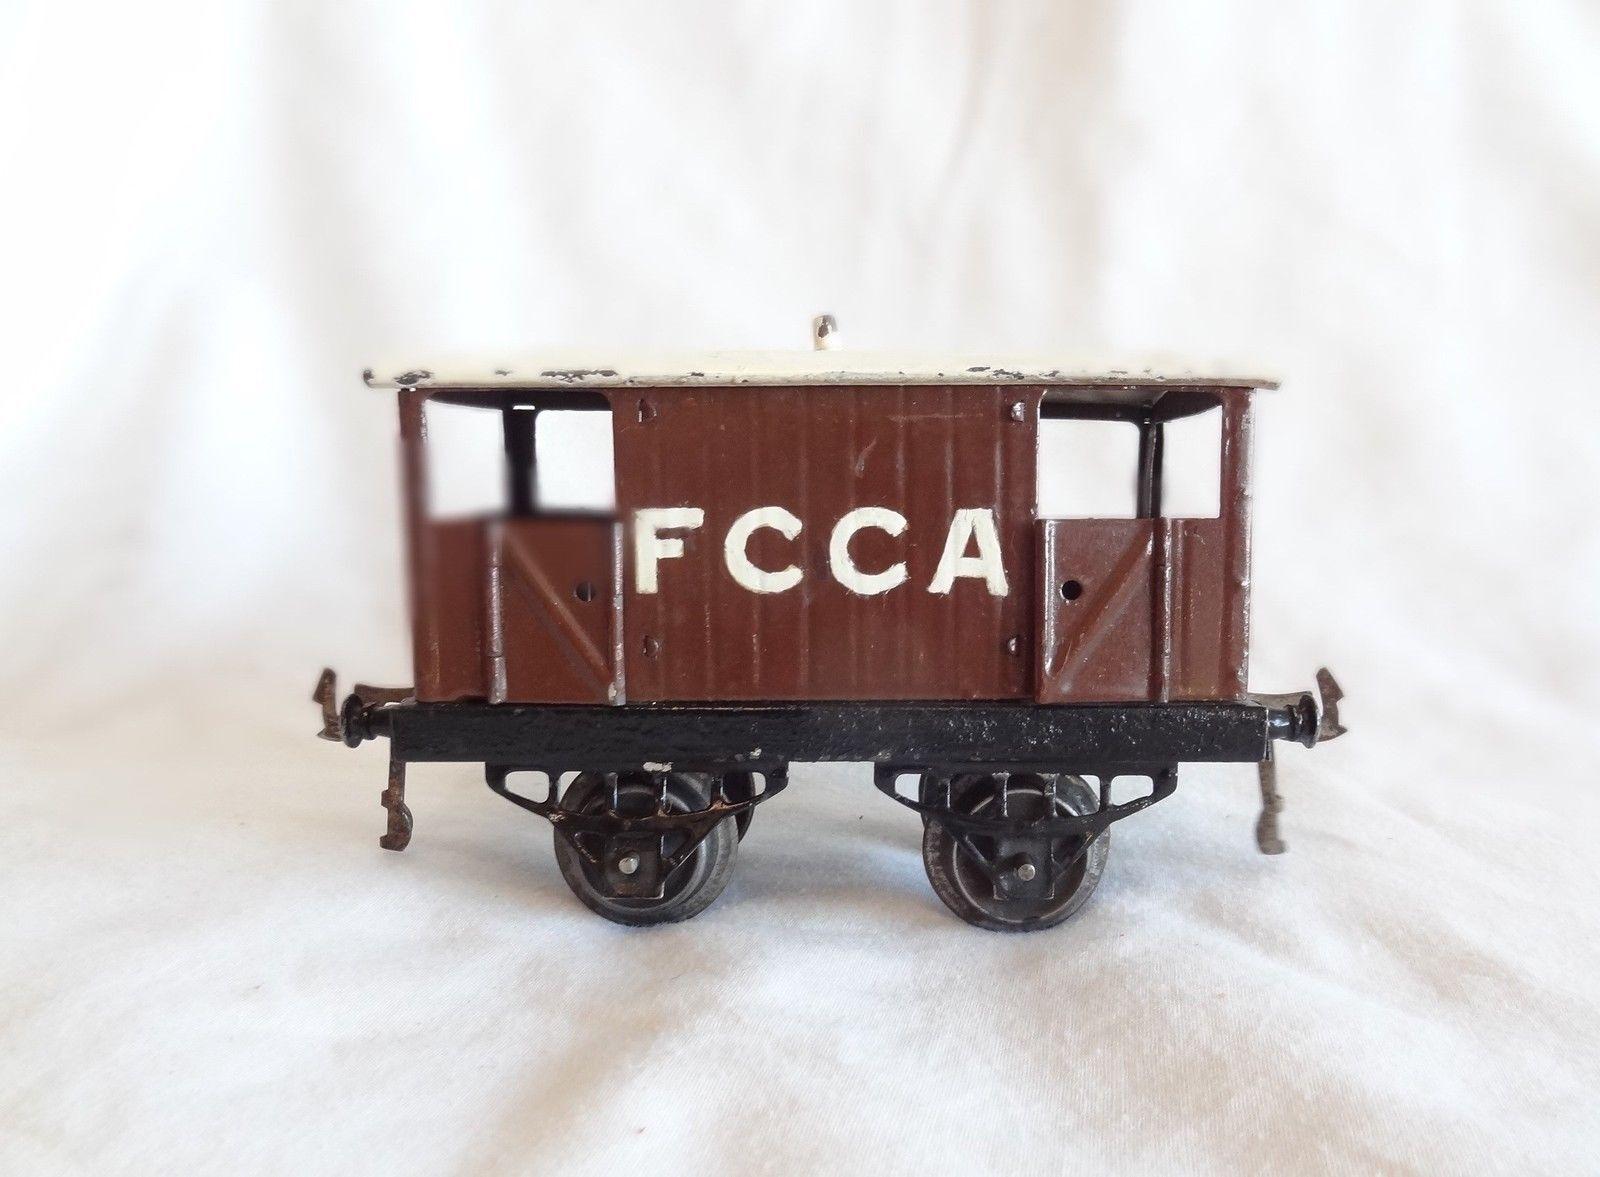 027C  Alte vor dem Krieg Hornby Export Silberinien O Spur Fcca Bremse Van